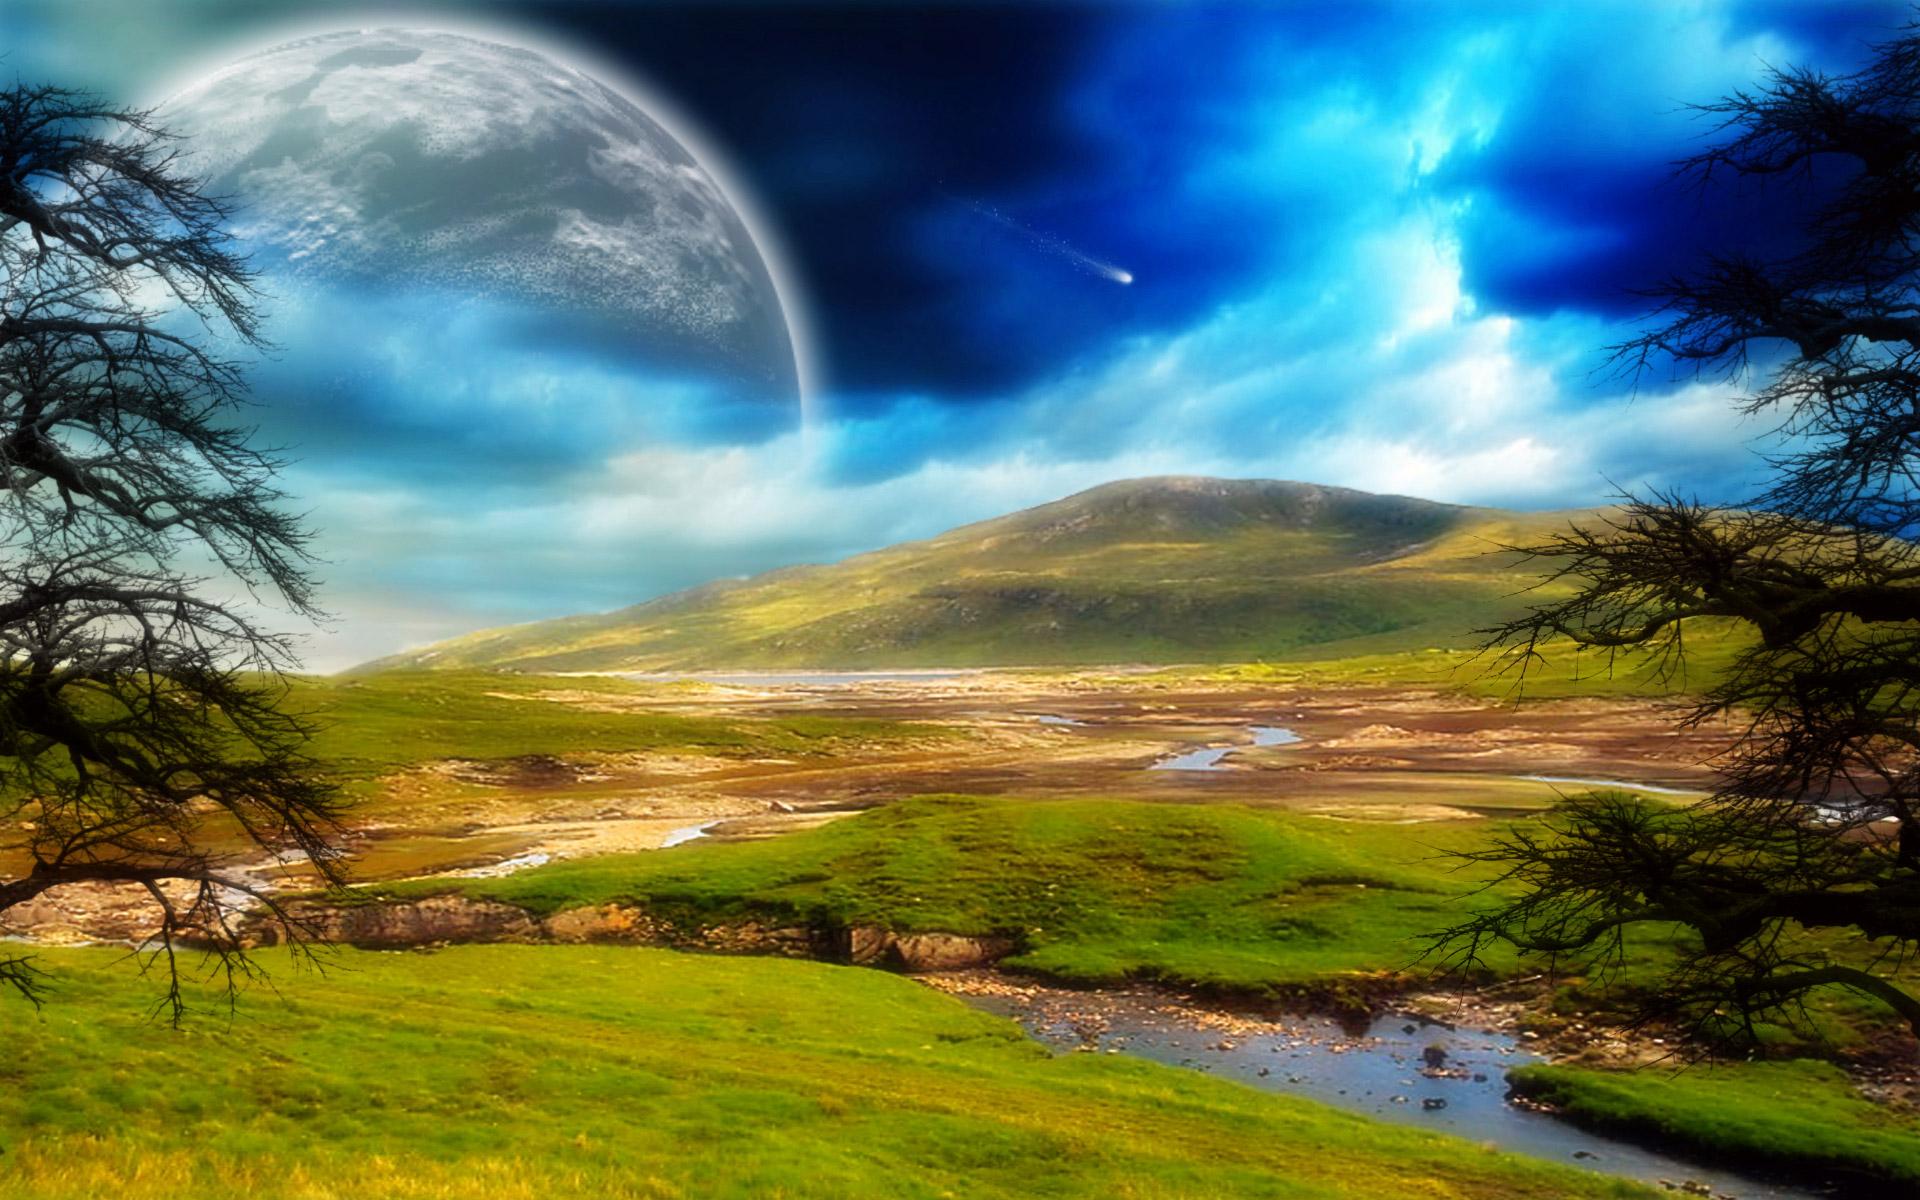 nice desktop backgrounds nature hd | Zellox